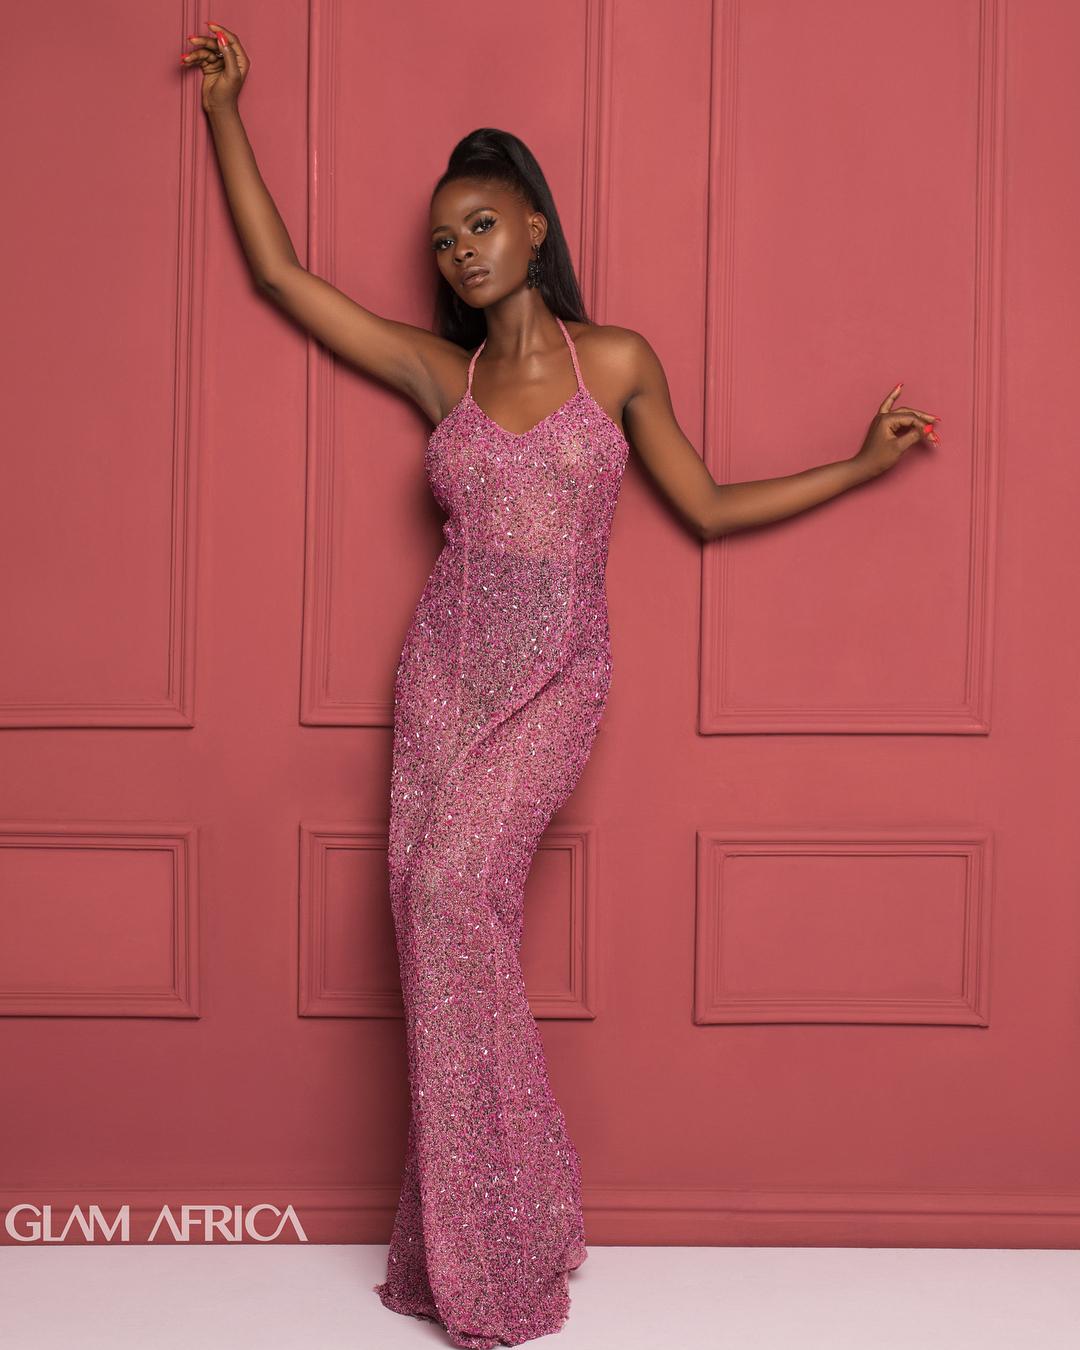 #BBNaija 2018 Housemates Pose For Glam Africa Magazine's Latest Issue!